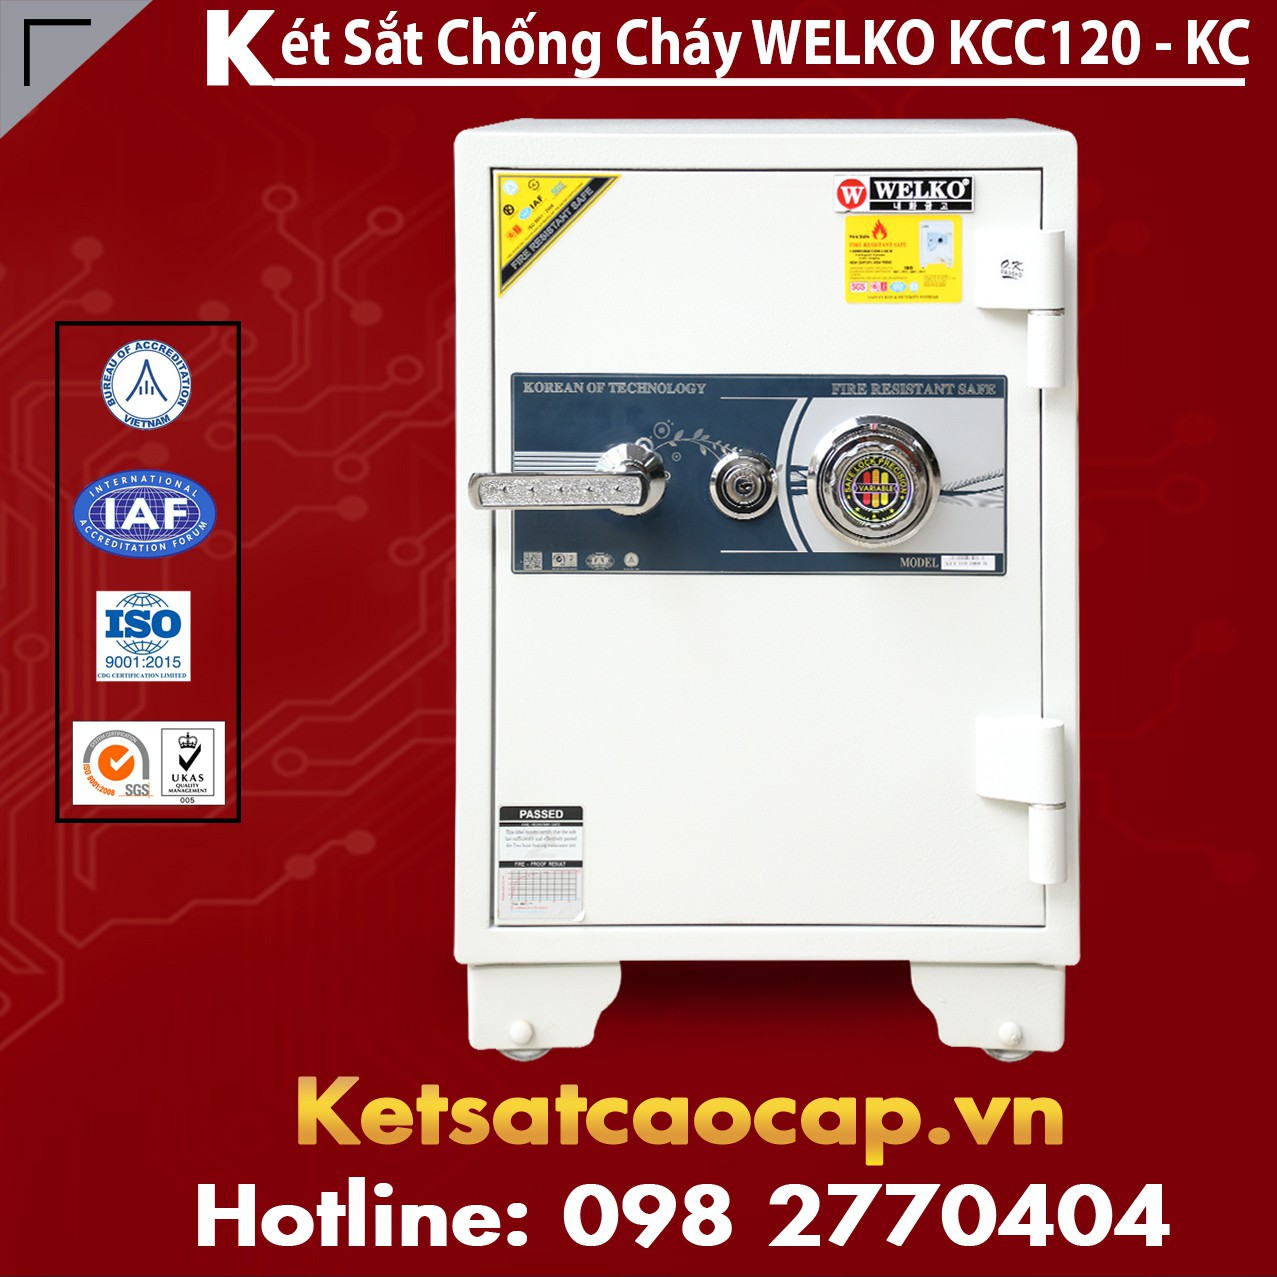 Mua Két Sắt KCC120 White - KC